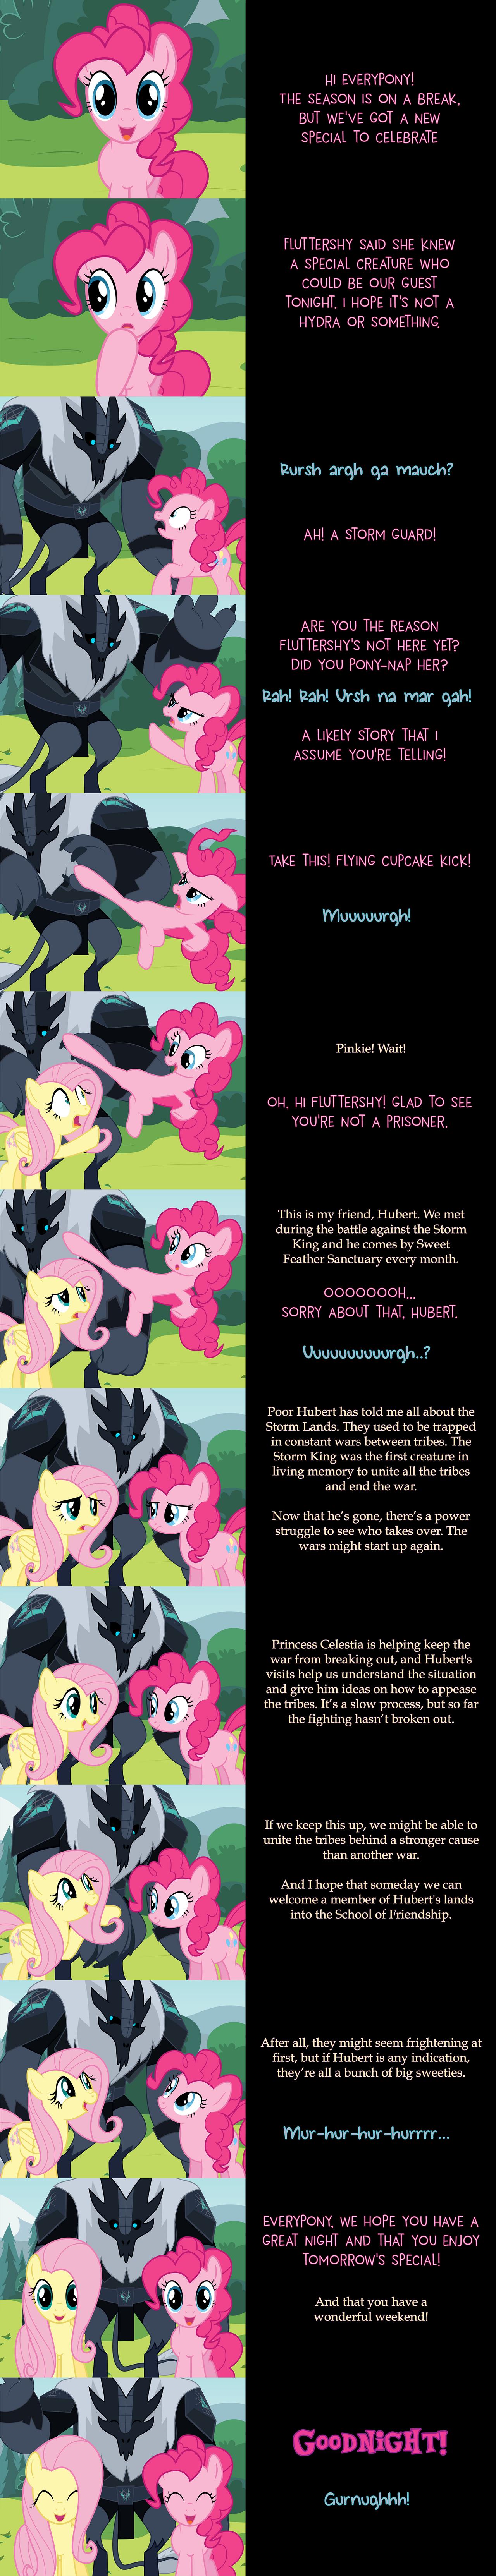 Pinkie Pie Says Goodnight: Storm Guarded